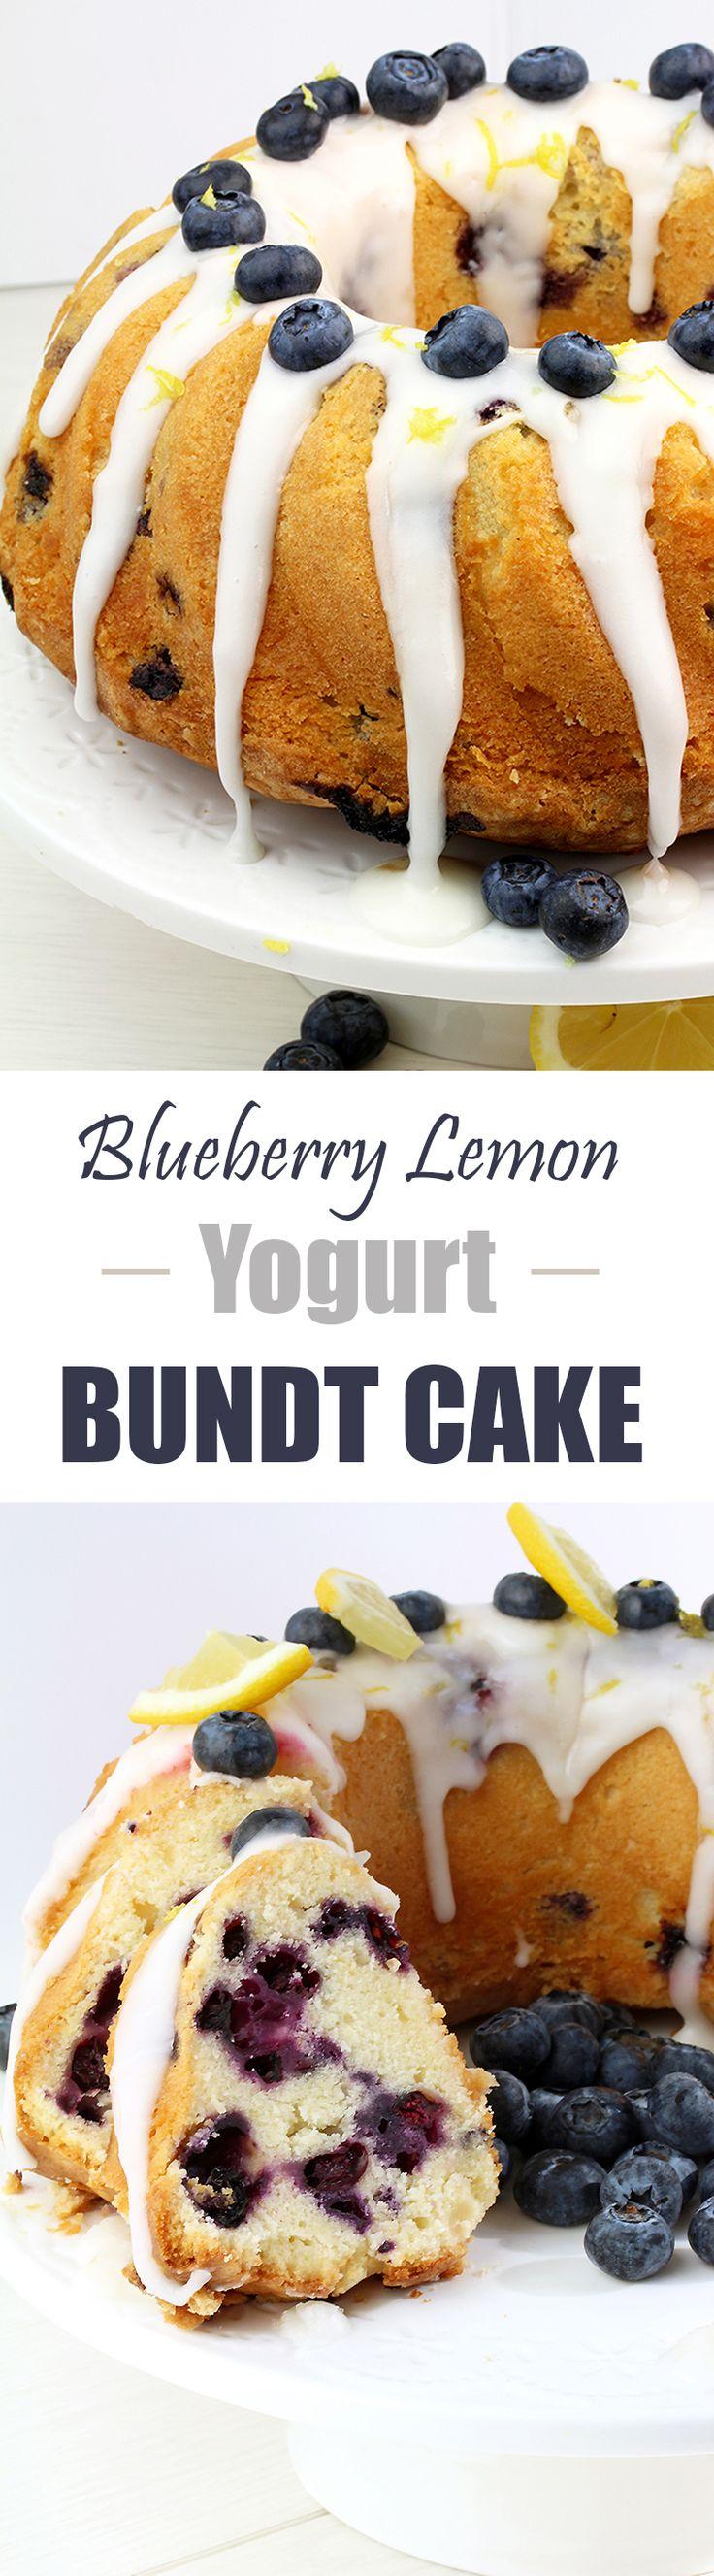 Blueberry Lemon Yogurt Bundt Cake – blueberry and lemon bination with a lemon icing give